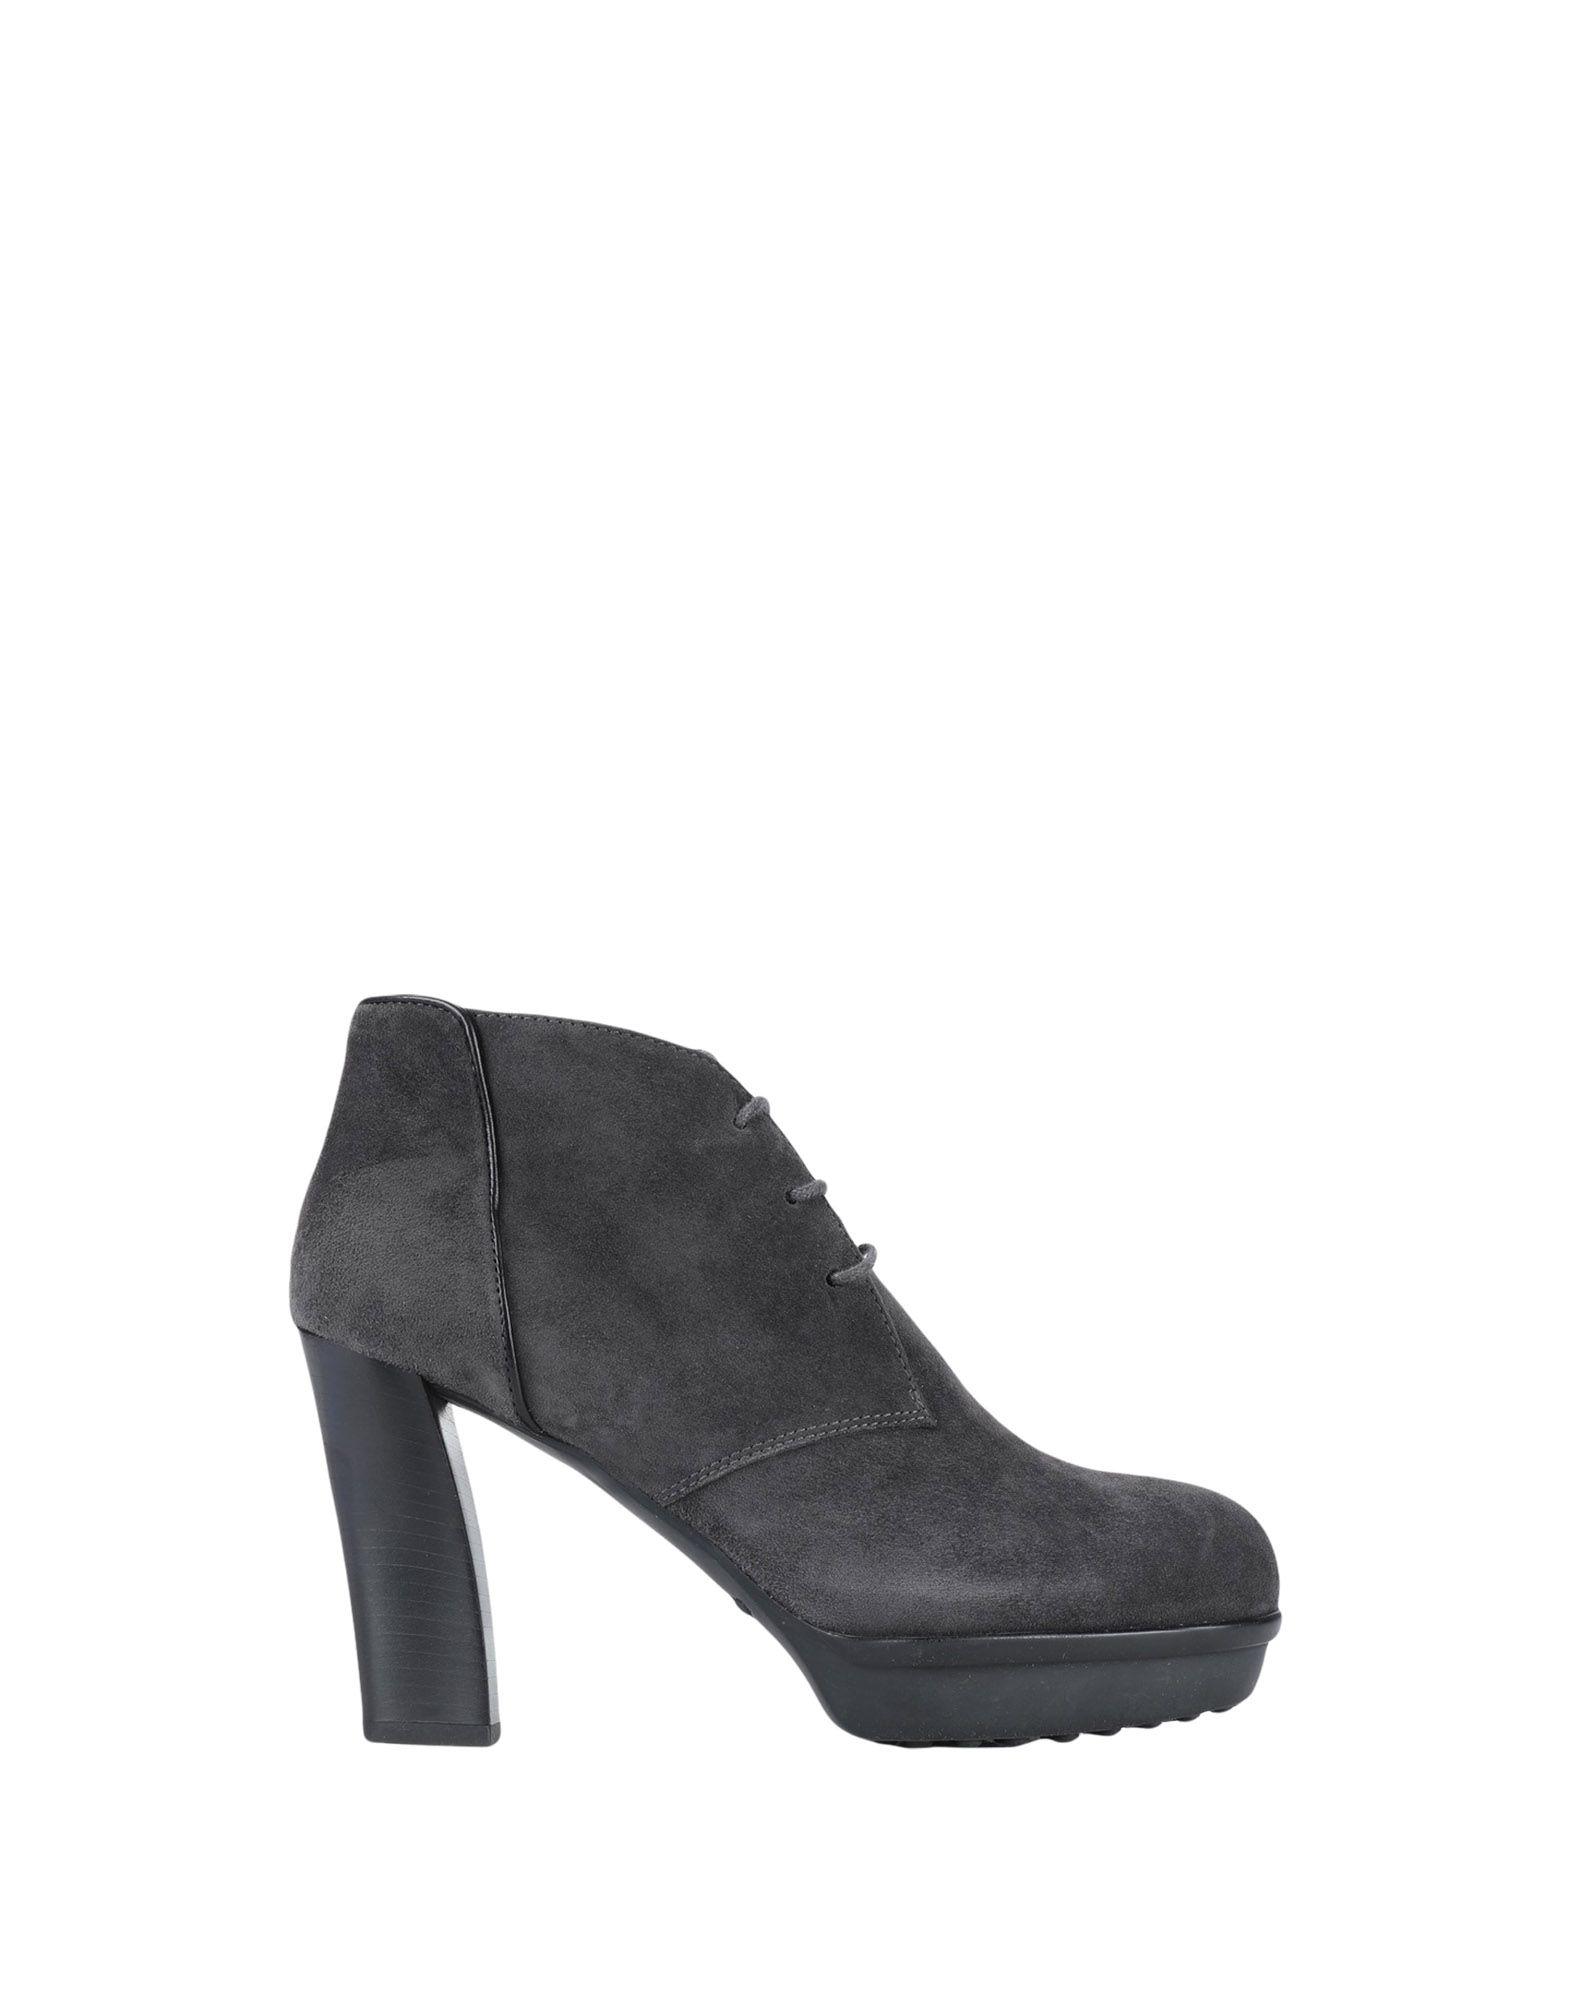 Rabatt Schuhe Tod's Damen Schnürschuhe Damen Tod's  11033962TR f5071c